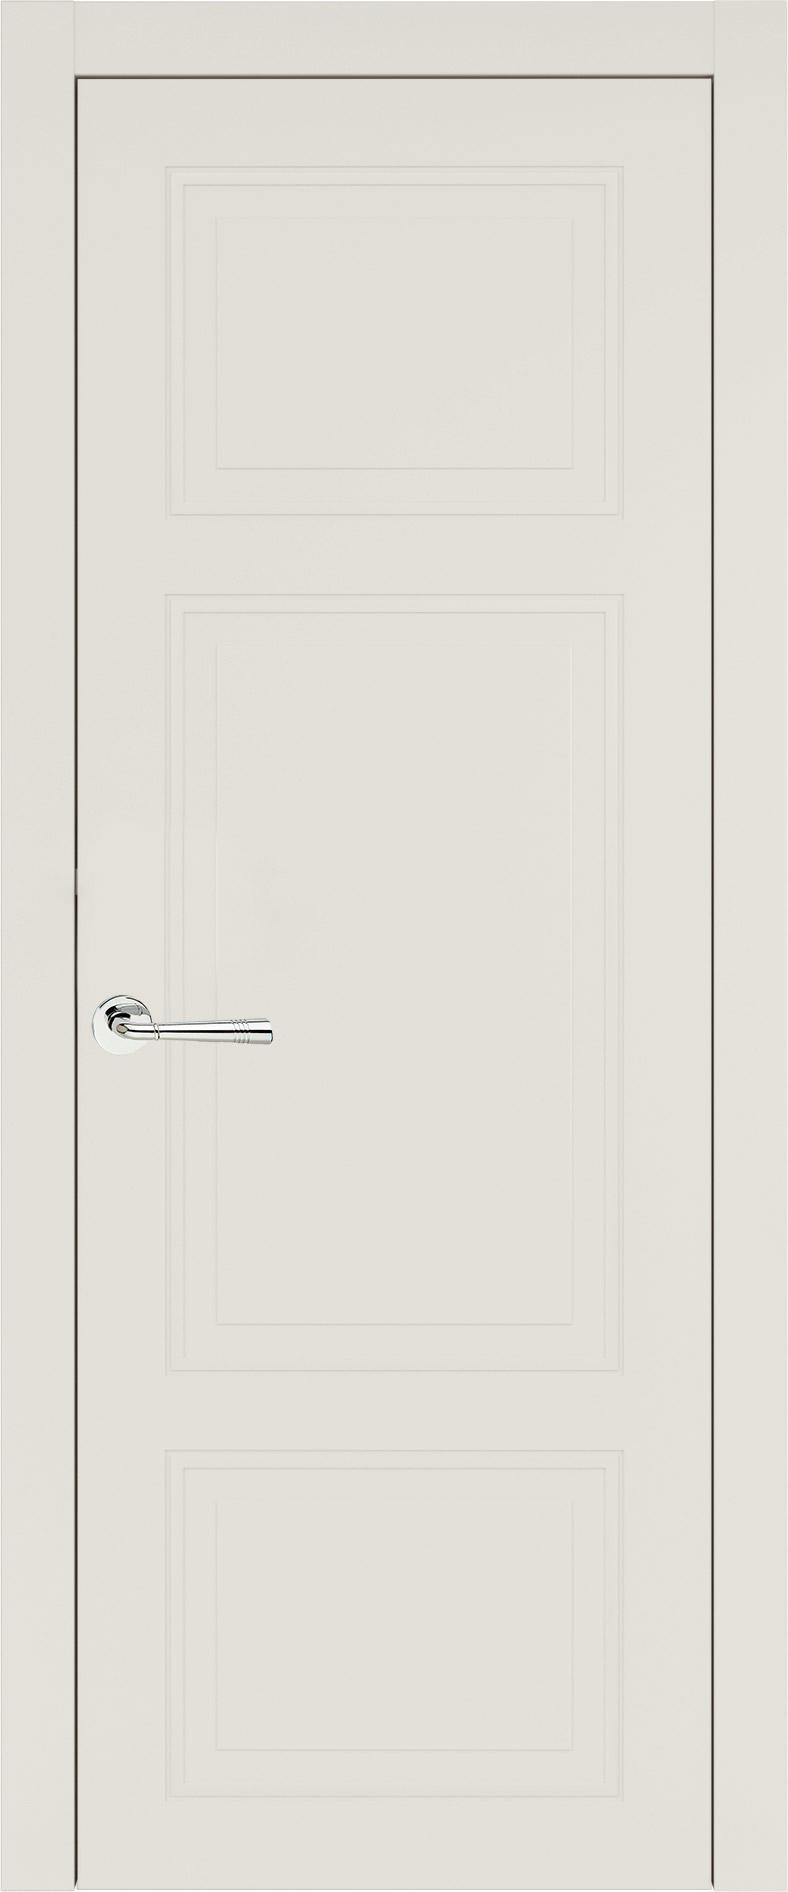 Siena Neo Classic цвет - Бежевая эмаль (RAL 9010) Без стекла (ДГ)